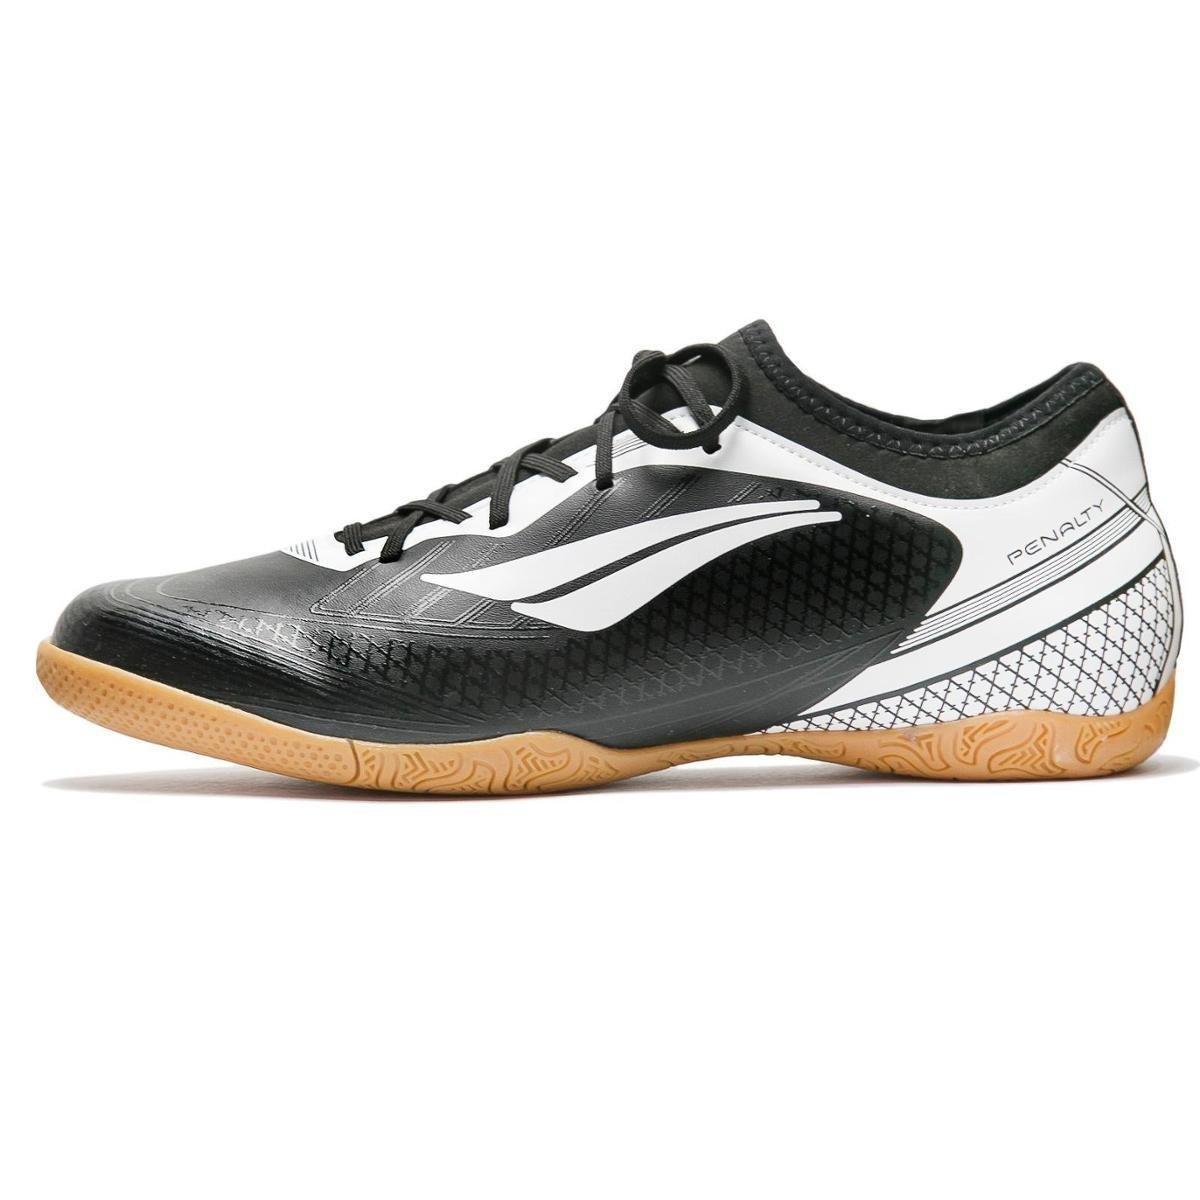 Tênys Futsal Penalty Liga Locker XX